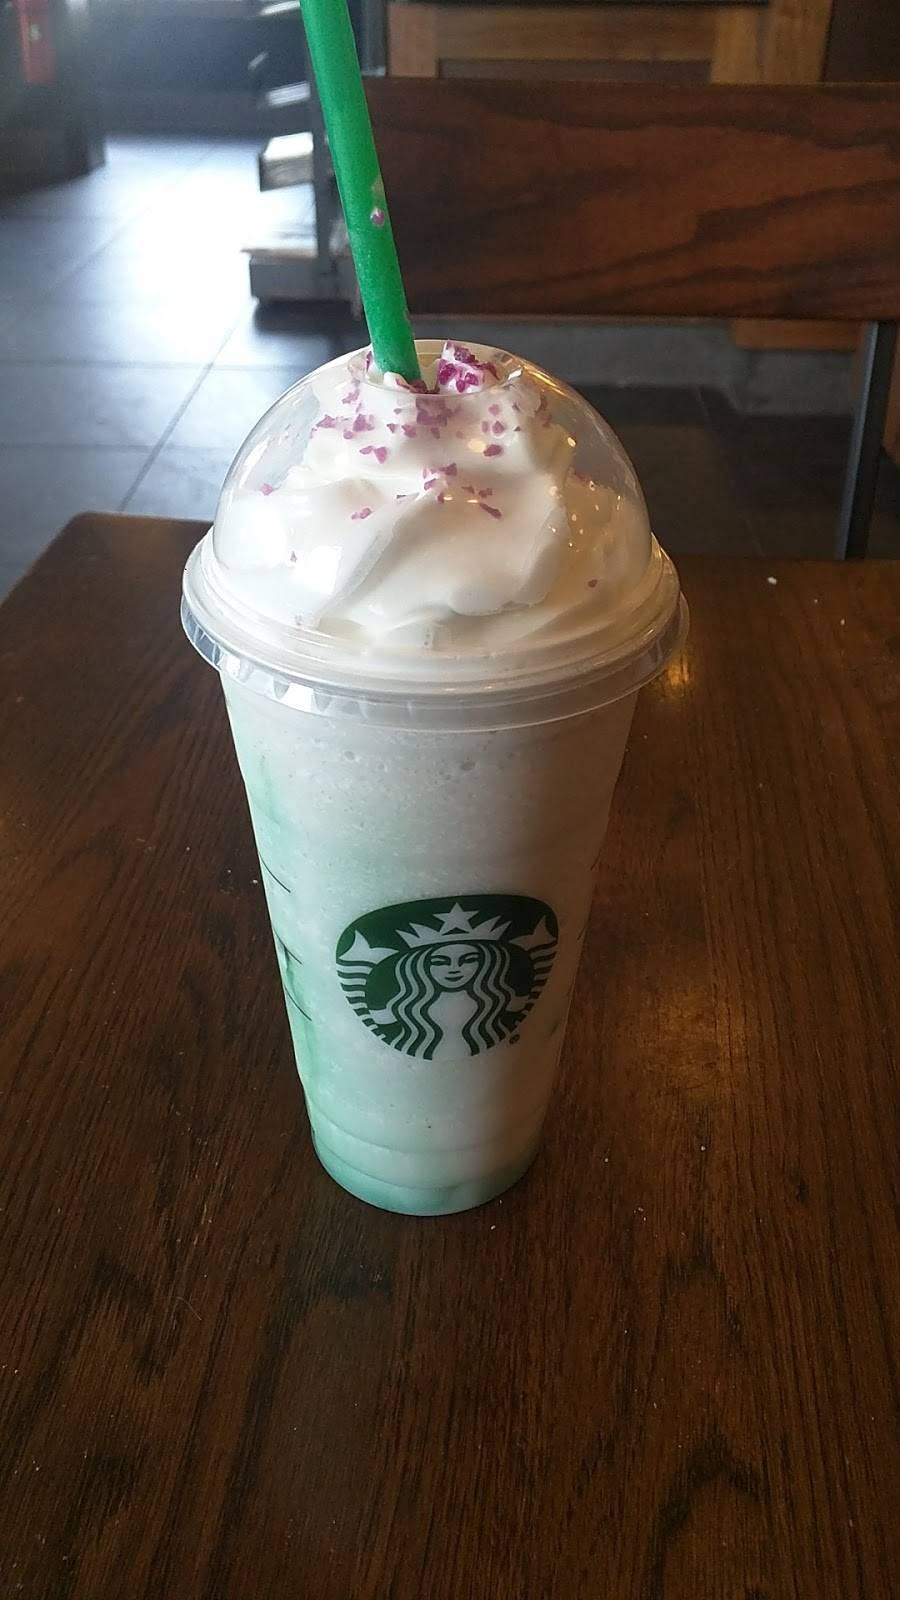 Starbucks   cafe   18051 Harwood Ave, Homewood, IL 60430, USA   7086478832 OR +1 708-647-8832